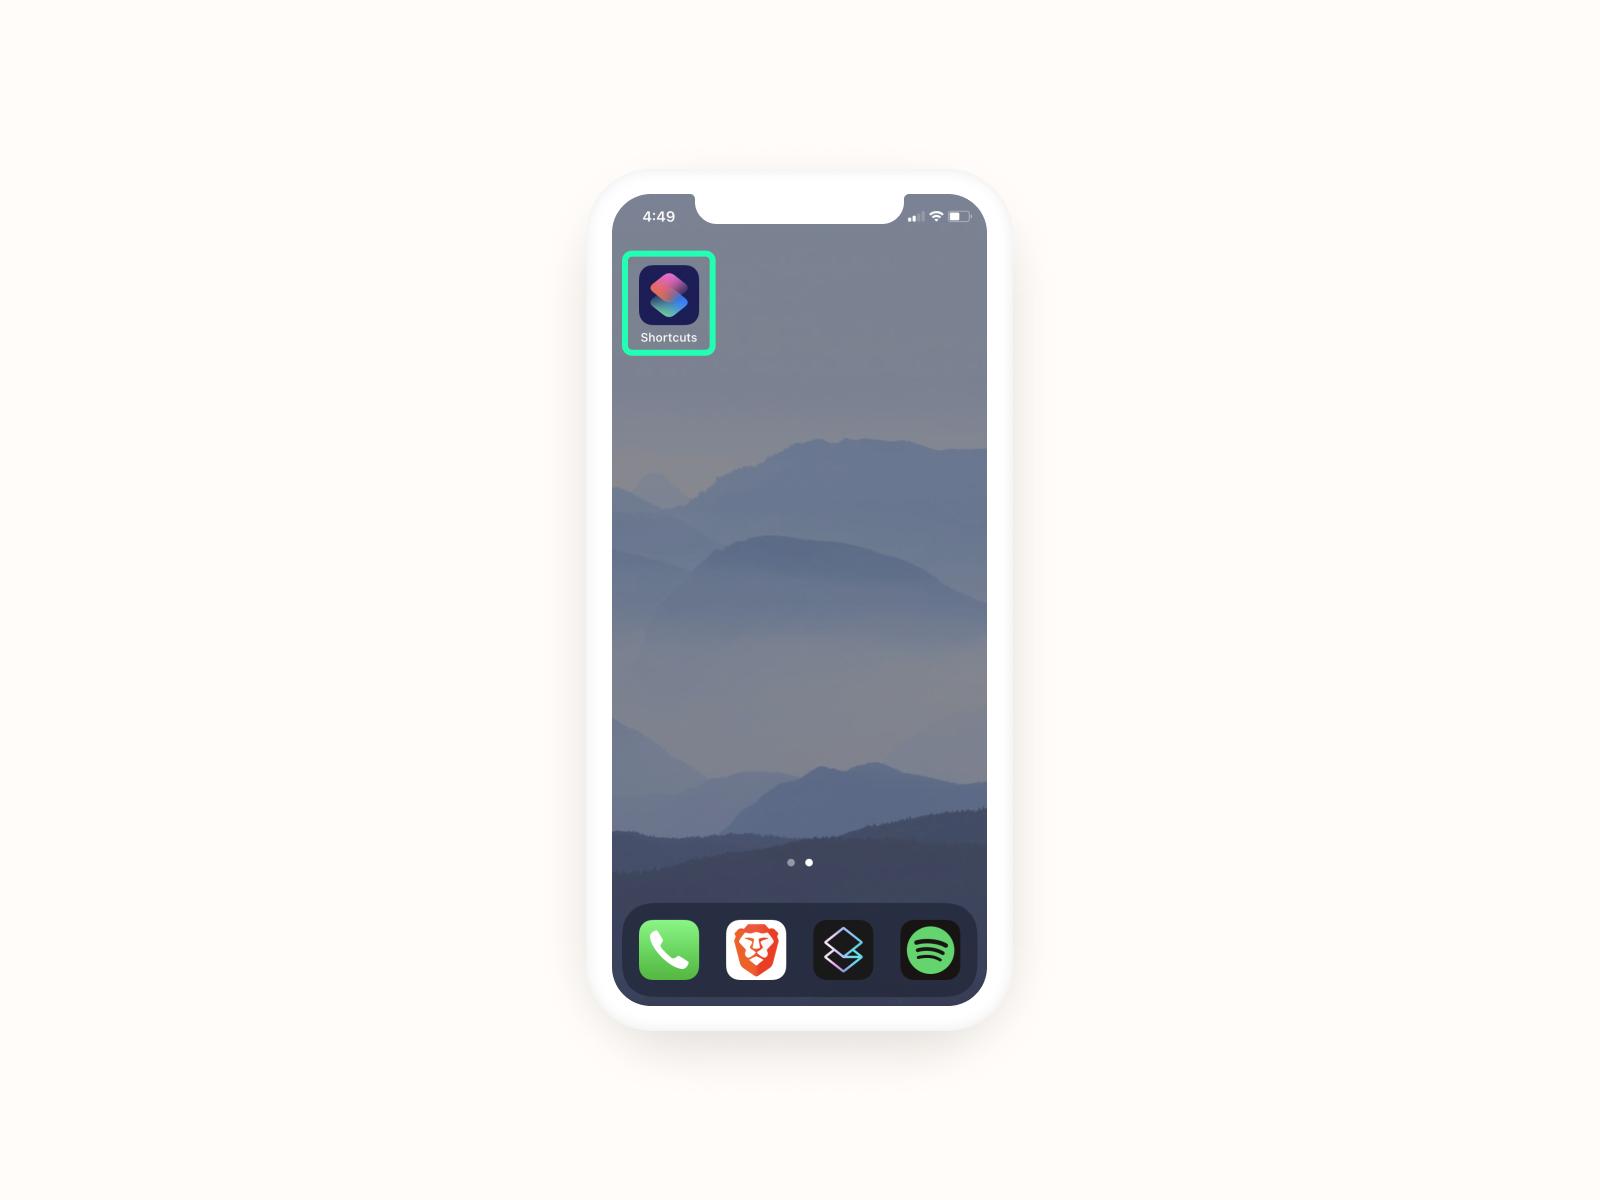 Open the Shortcuts app